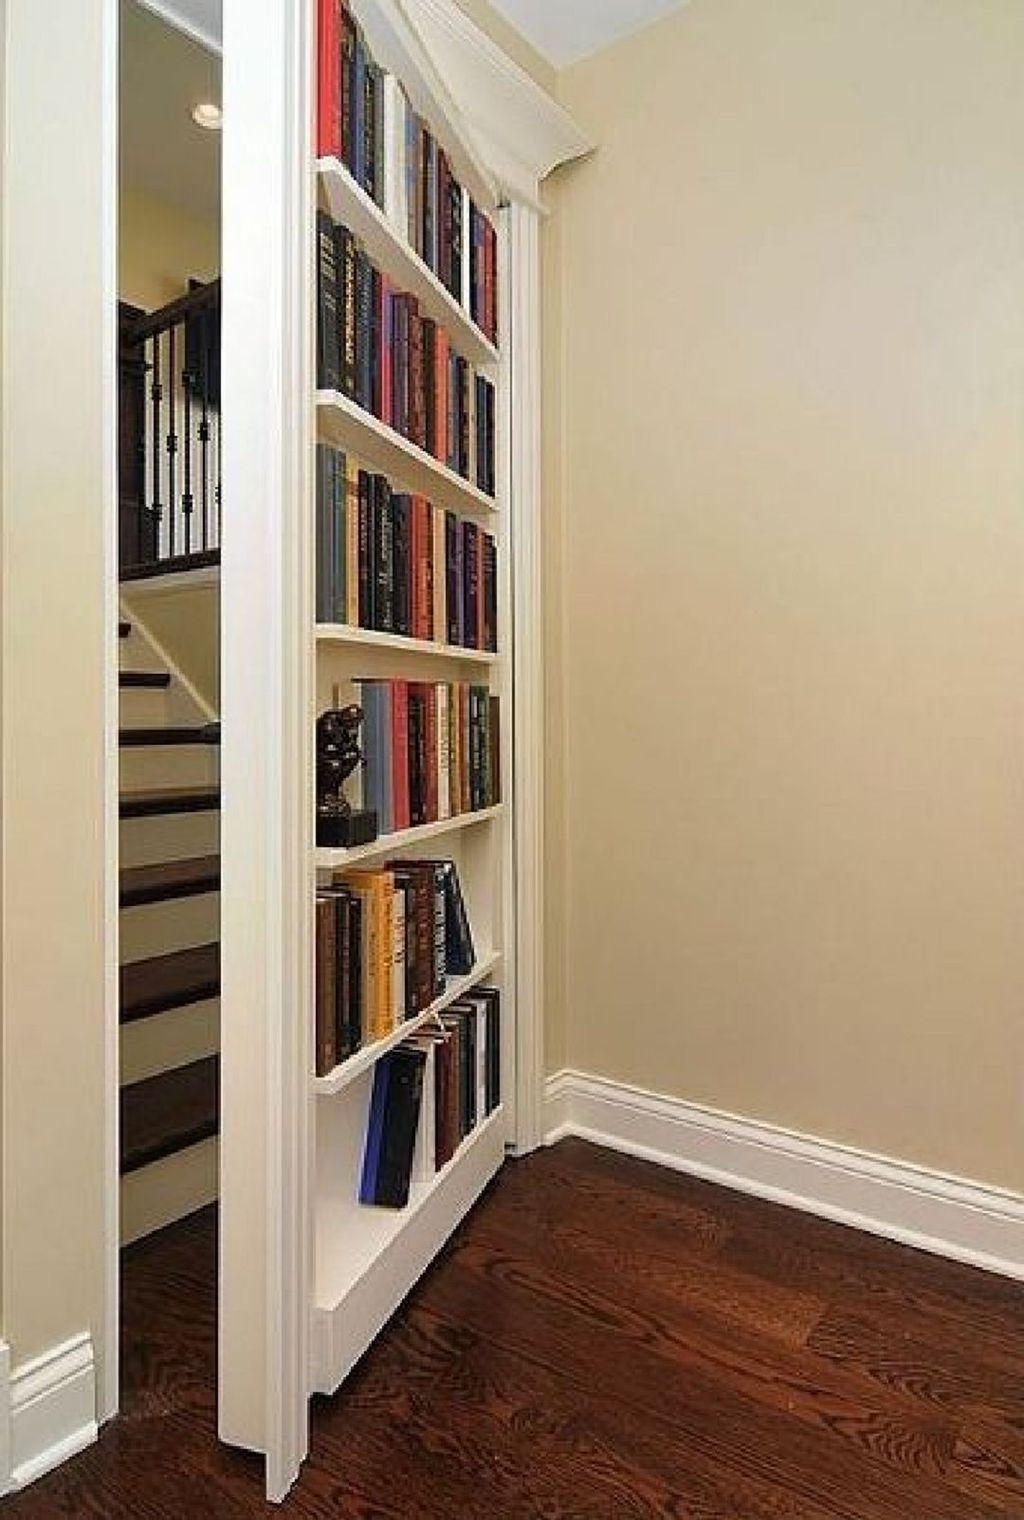 Trendy Bookshelf Designs Ideas Are Popular This Year33